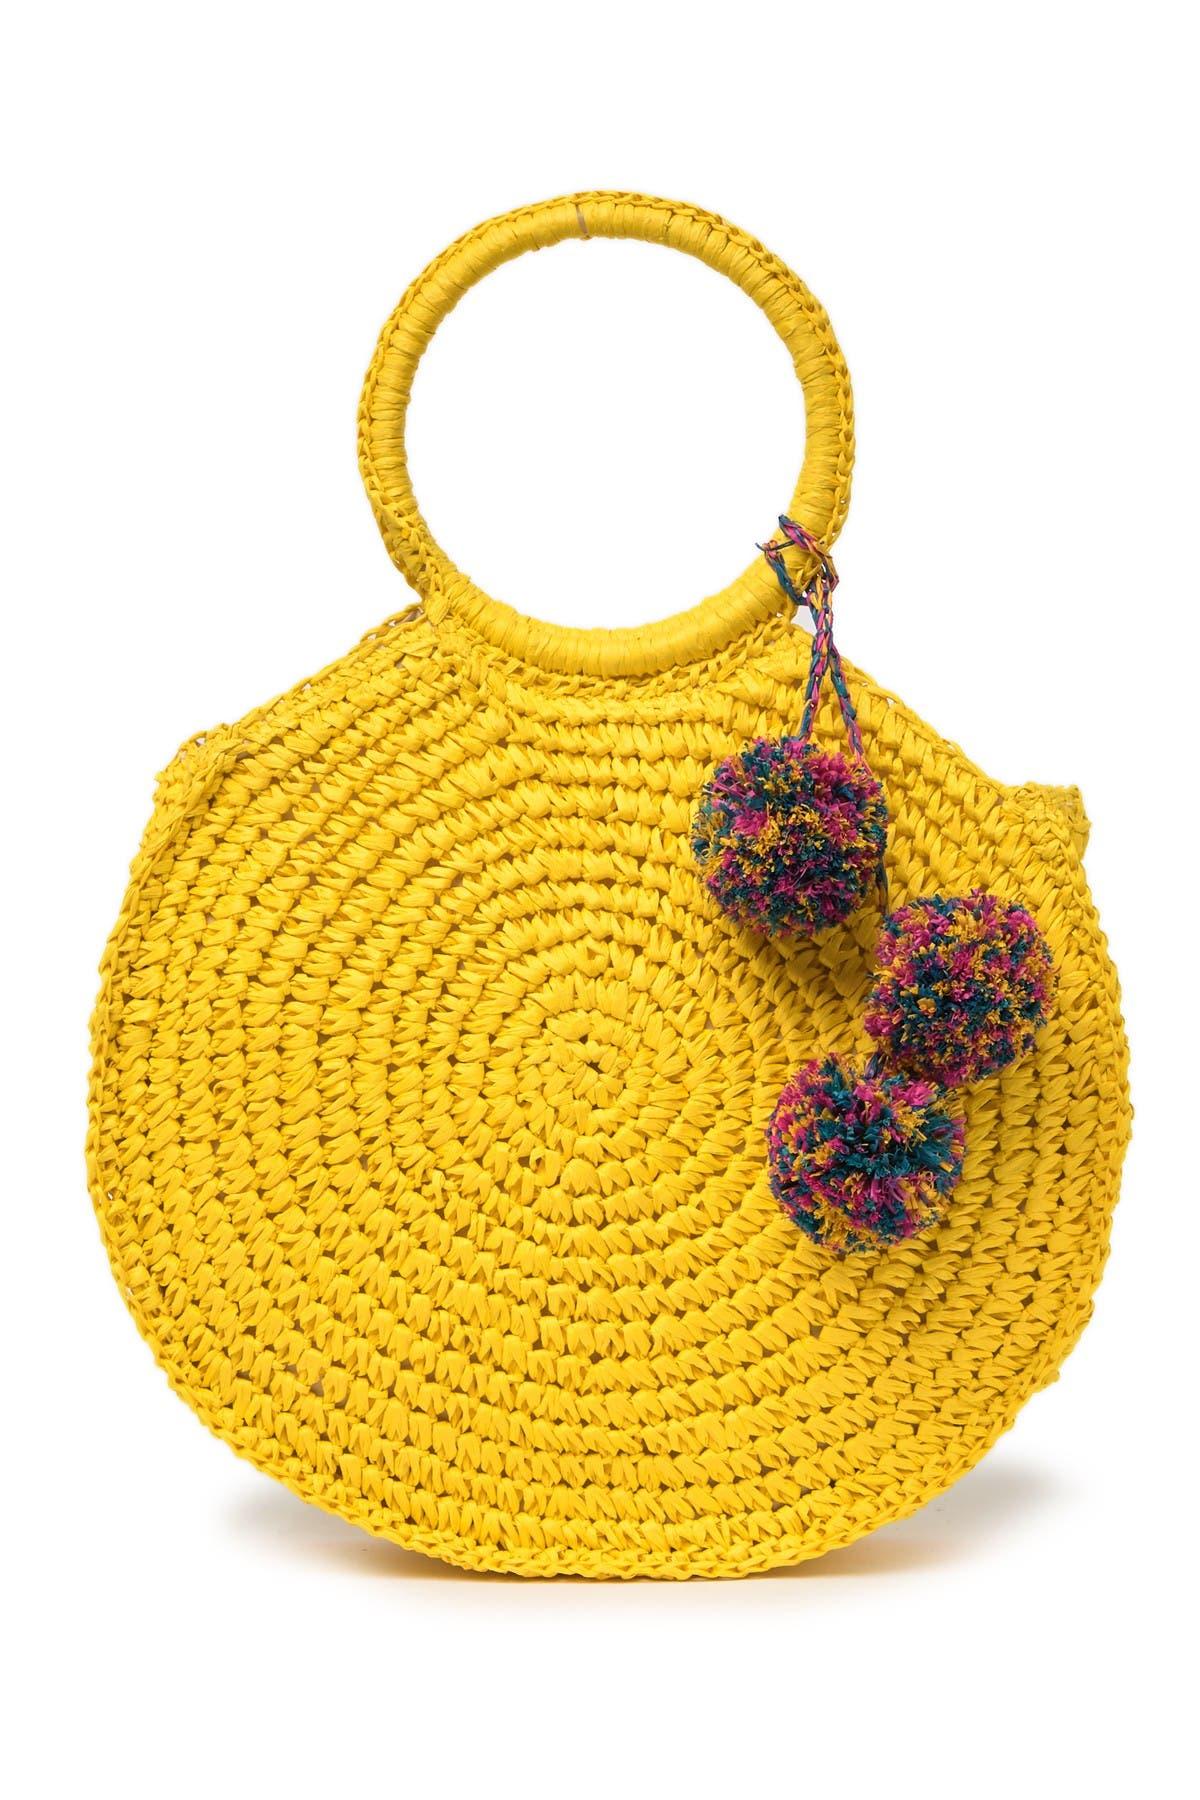 Image of Melrose and Market Straw O-Ring Handle Bag